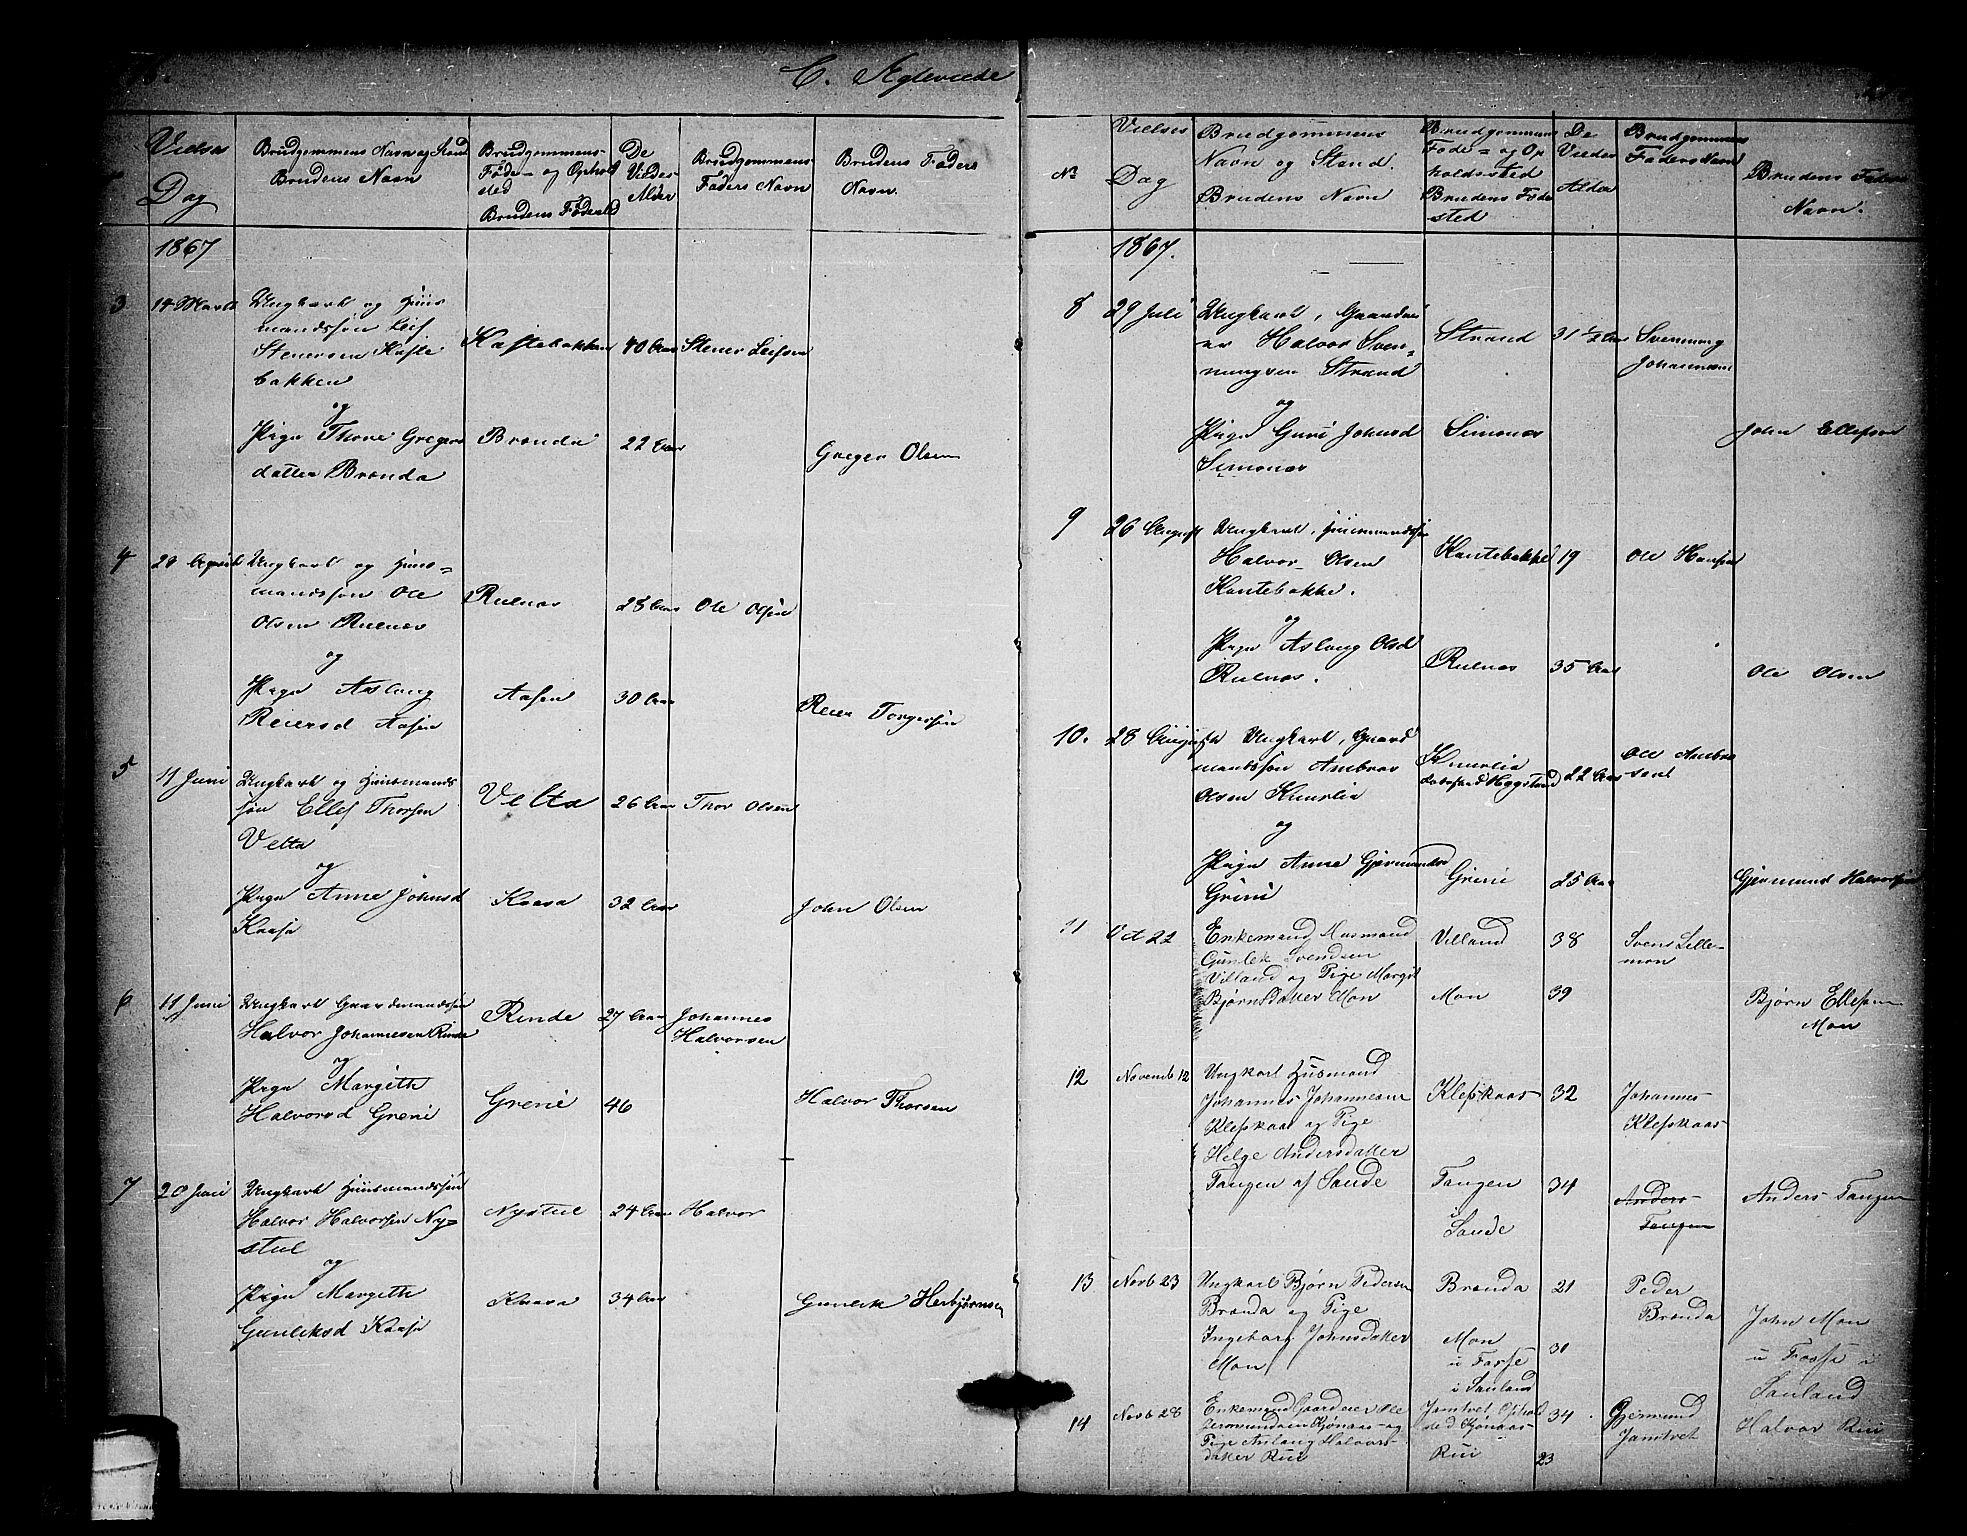 SAKO, Heddal kirkebøker, G/Ga/L0001: Klokkerbok nr. I 1, 1866-1878, s. 296-297